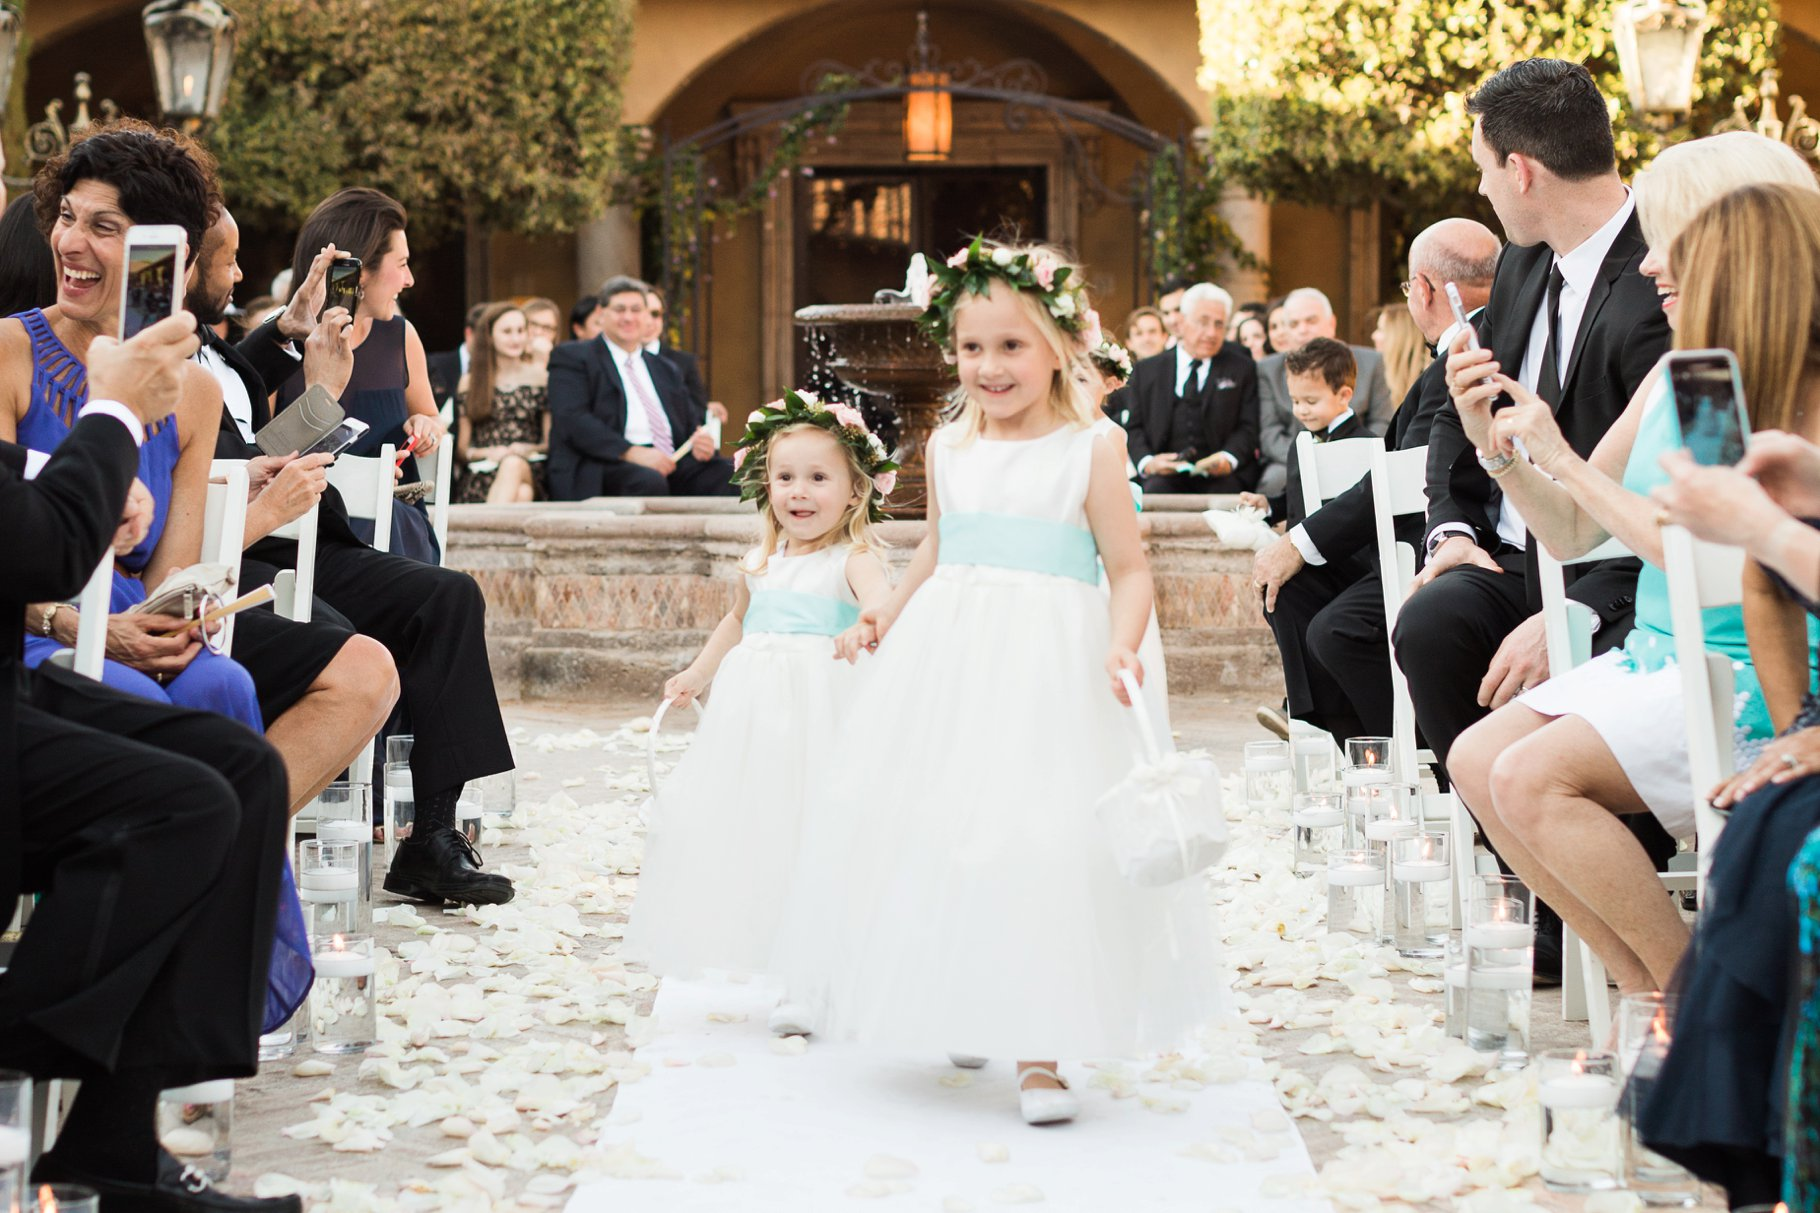 villa siena wedding-066_GRETCHEN WAKEMAN PHOTOGRAPHY.jpg